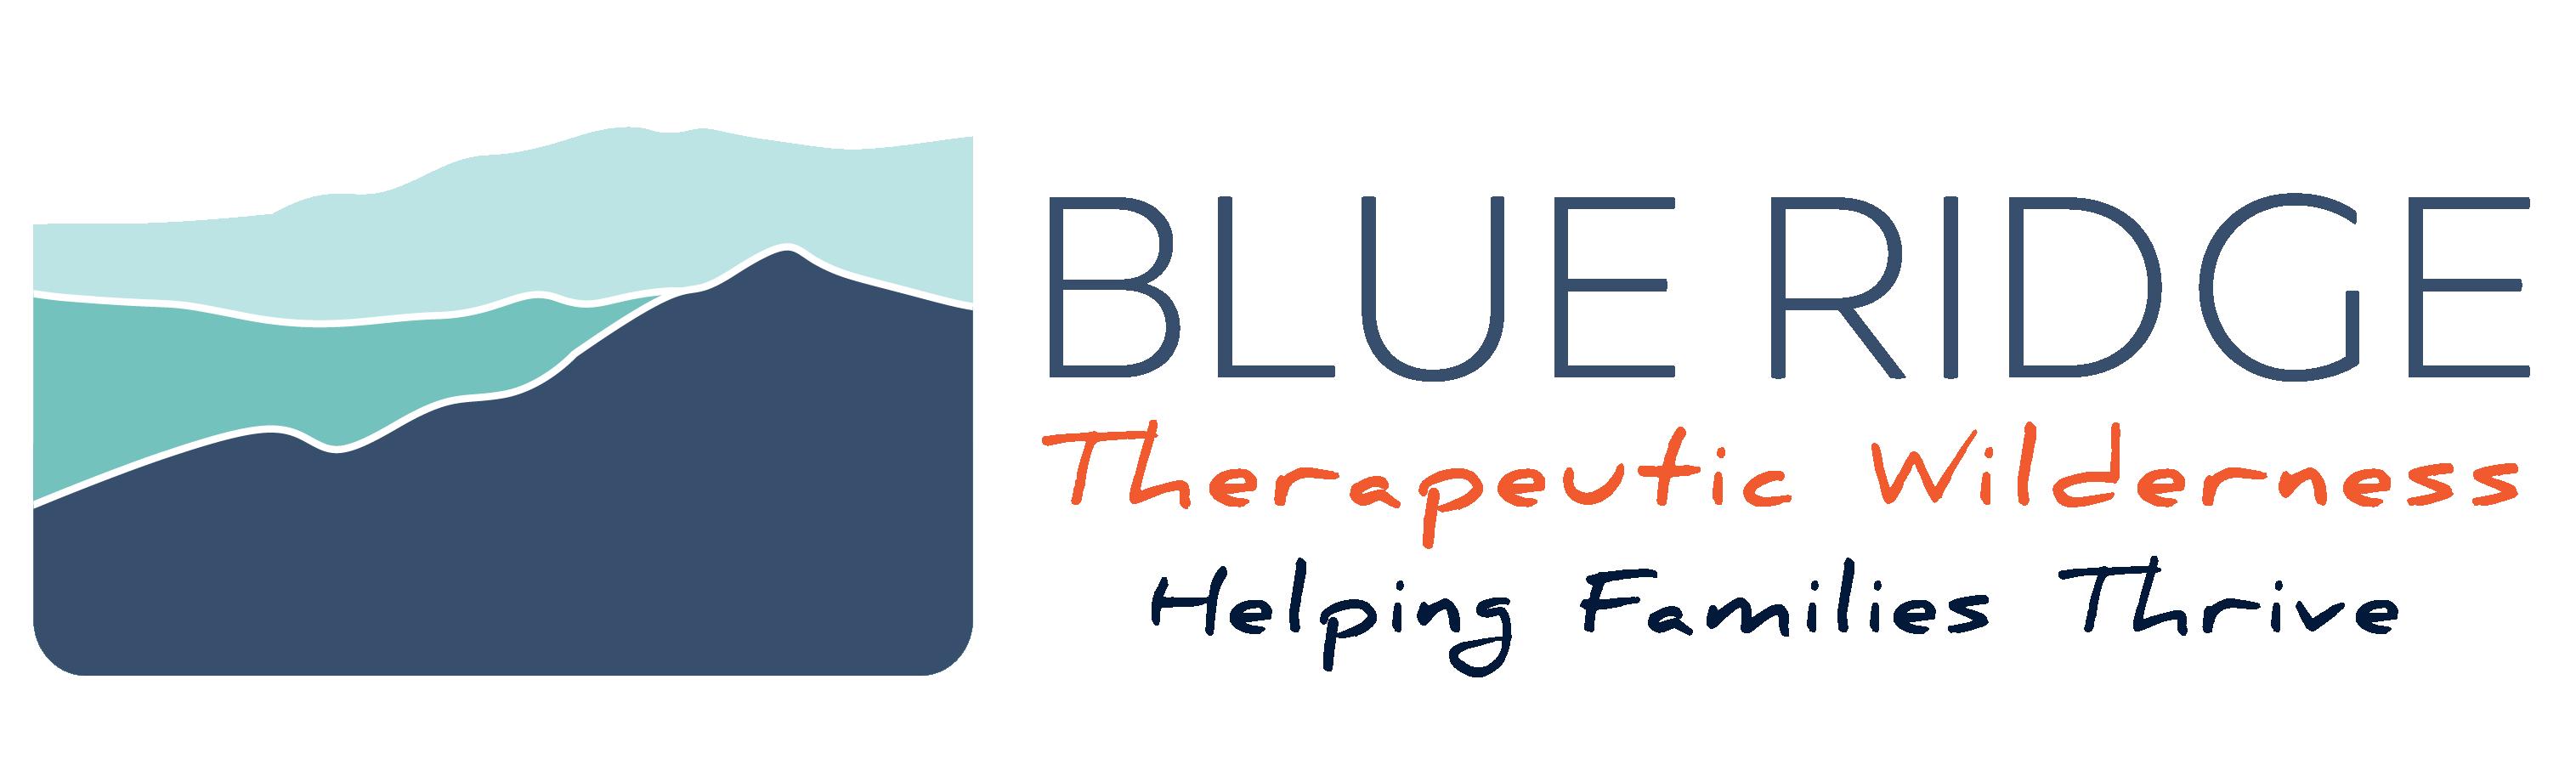 logo, Blue Ridge Therapeutic Wilderness